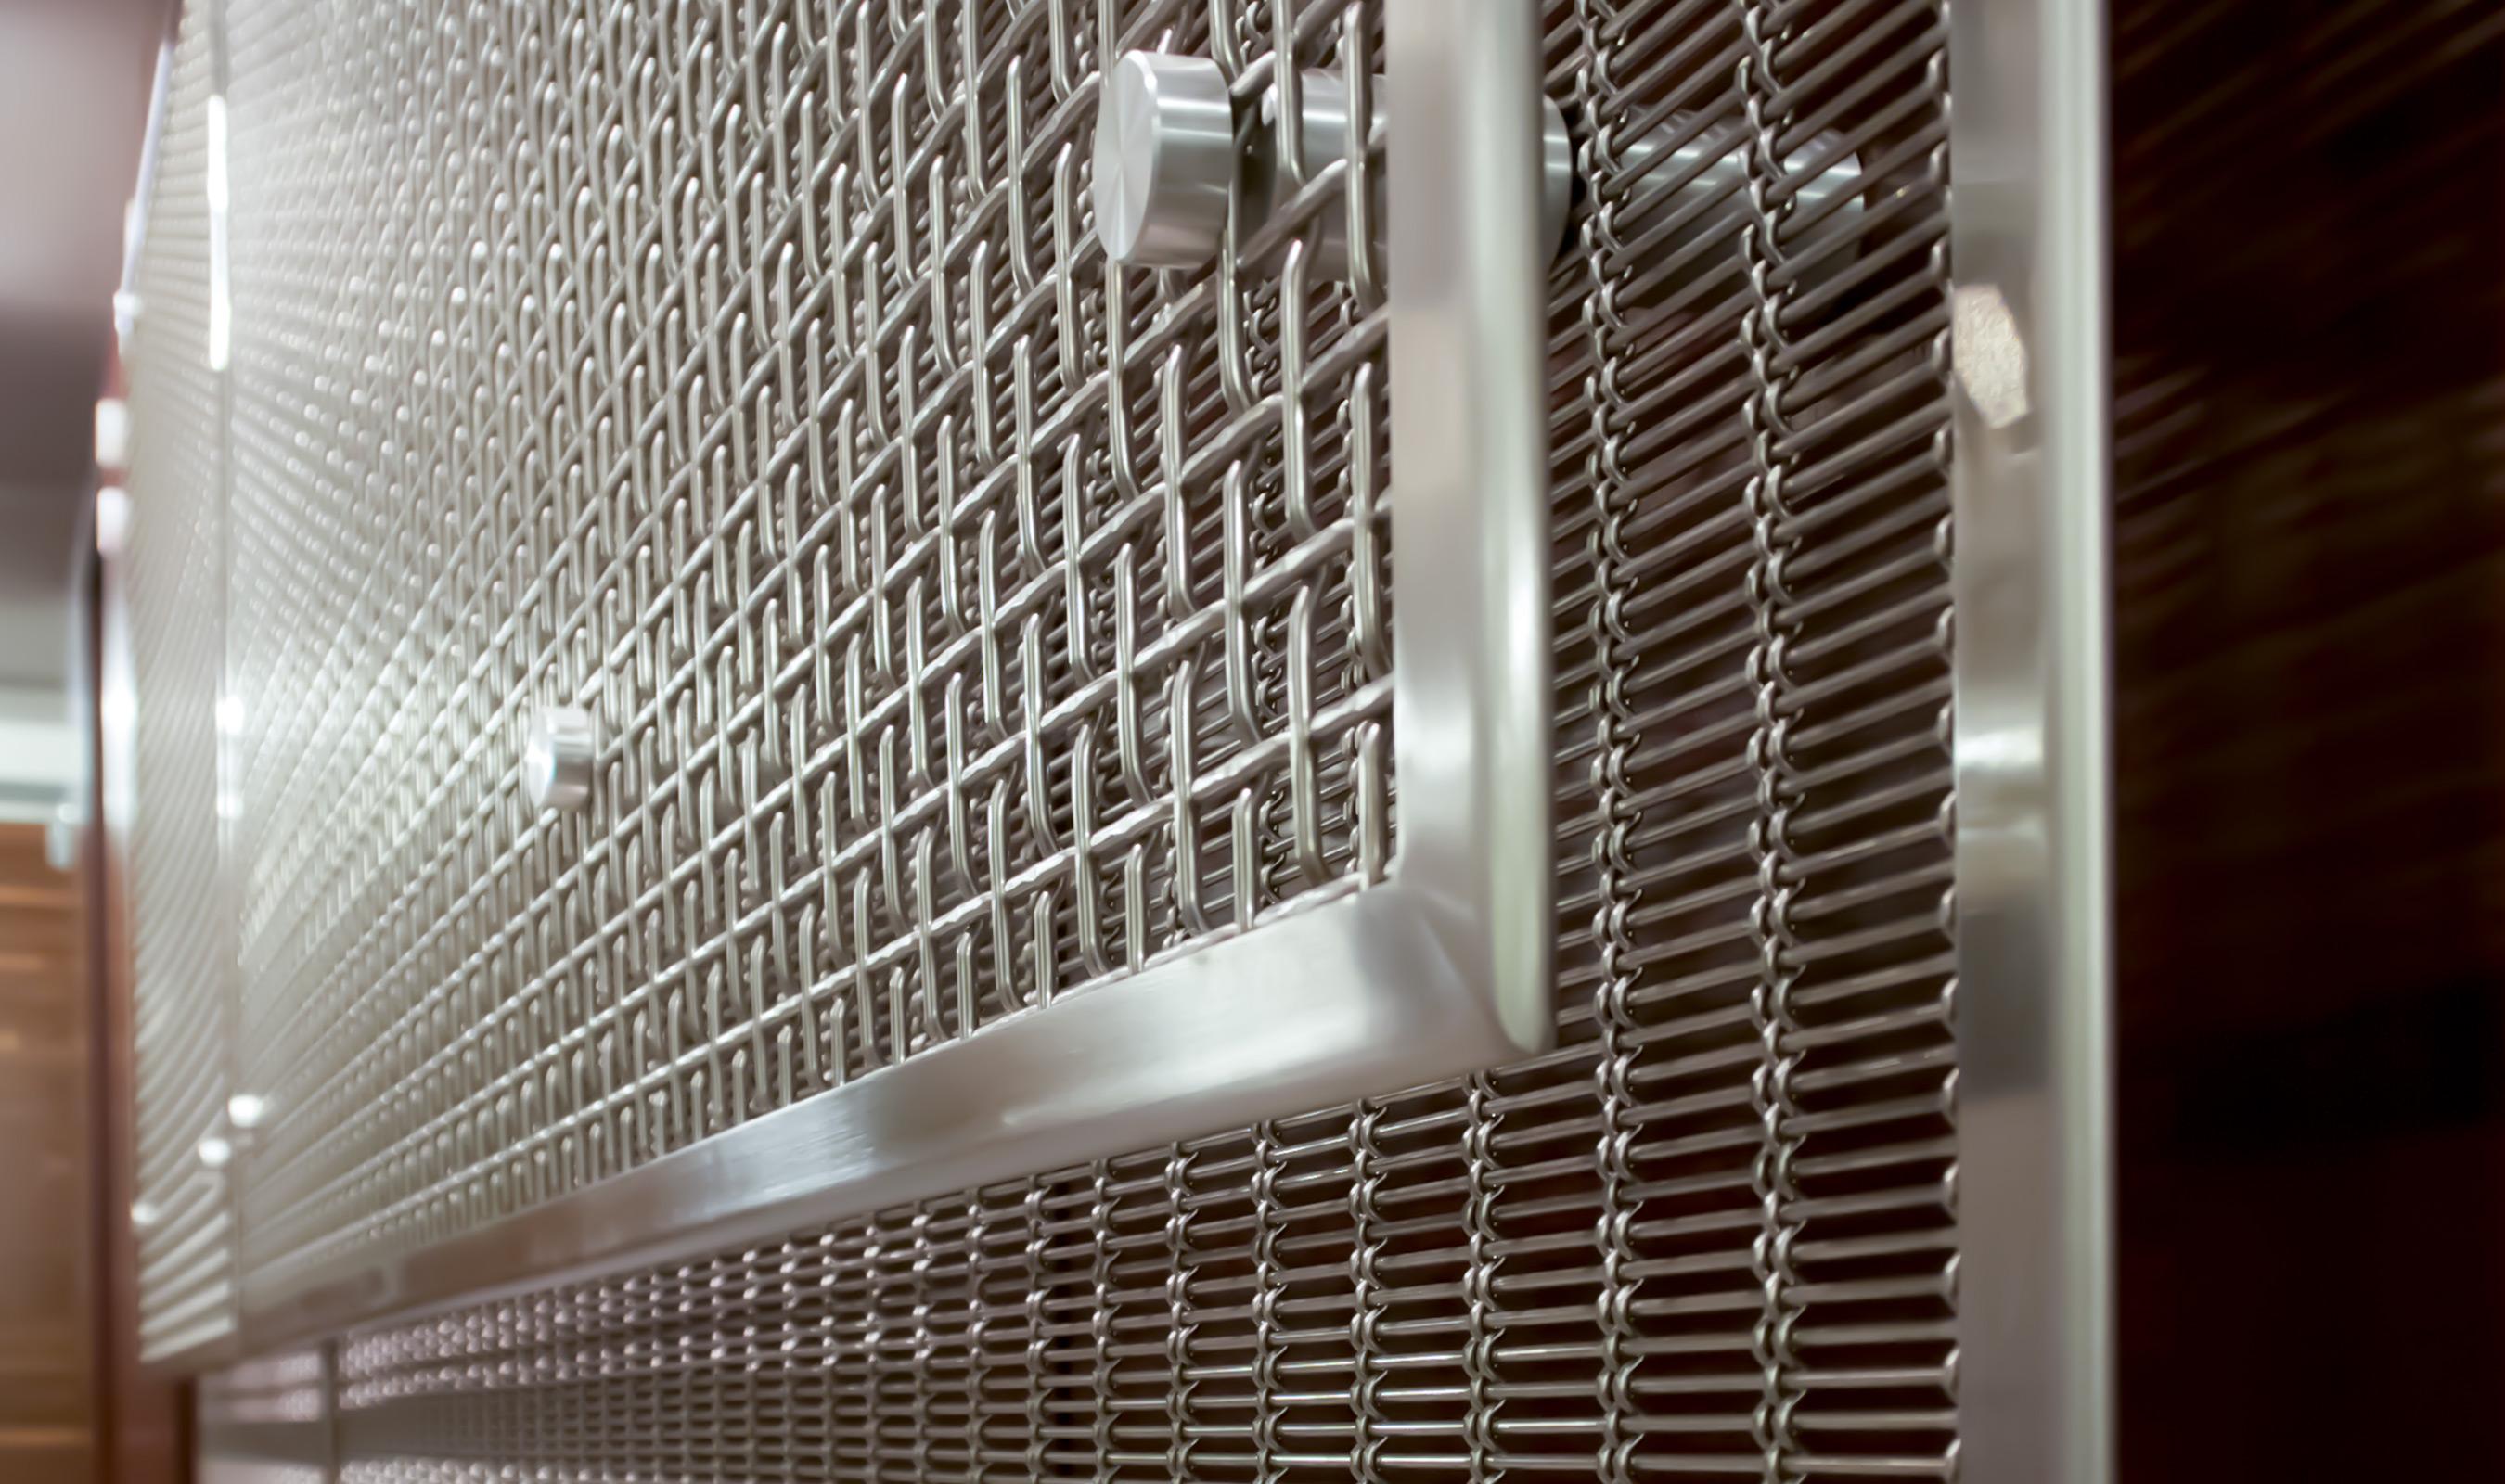 F-48 wire mesh panels using wall standoffs